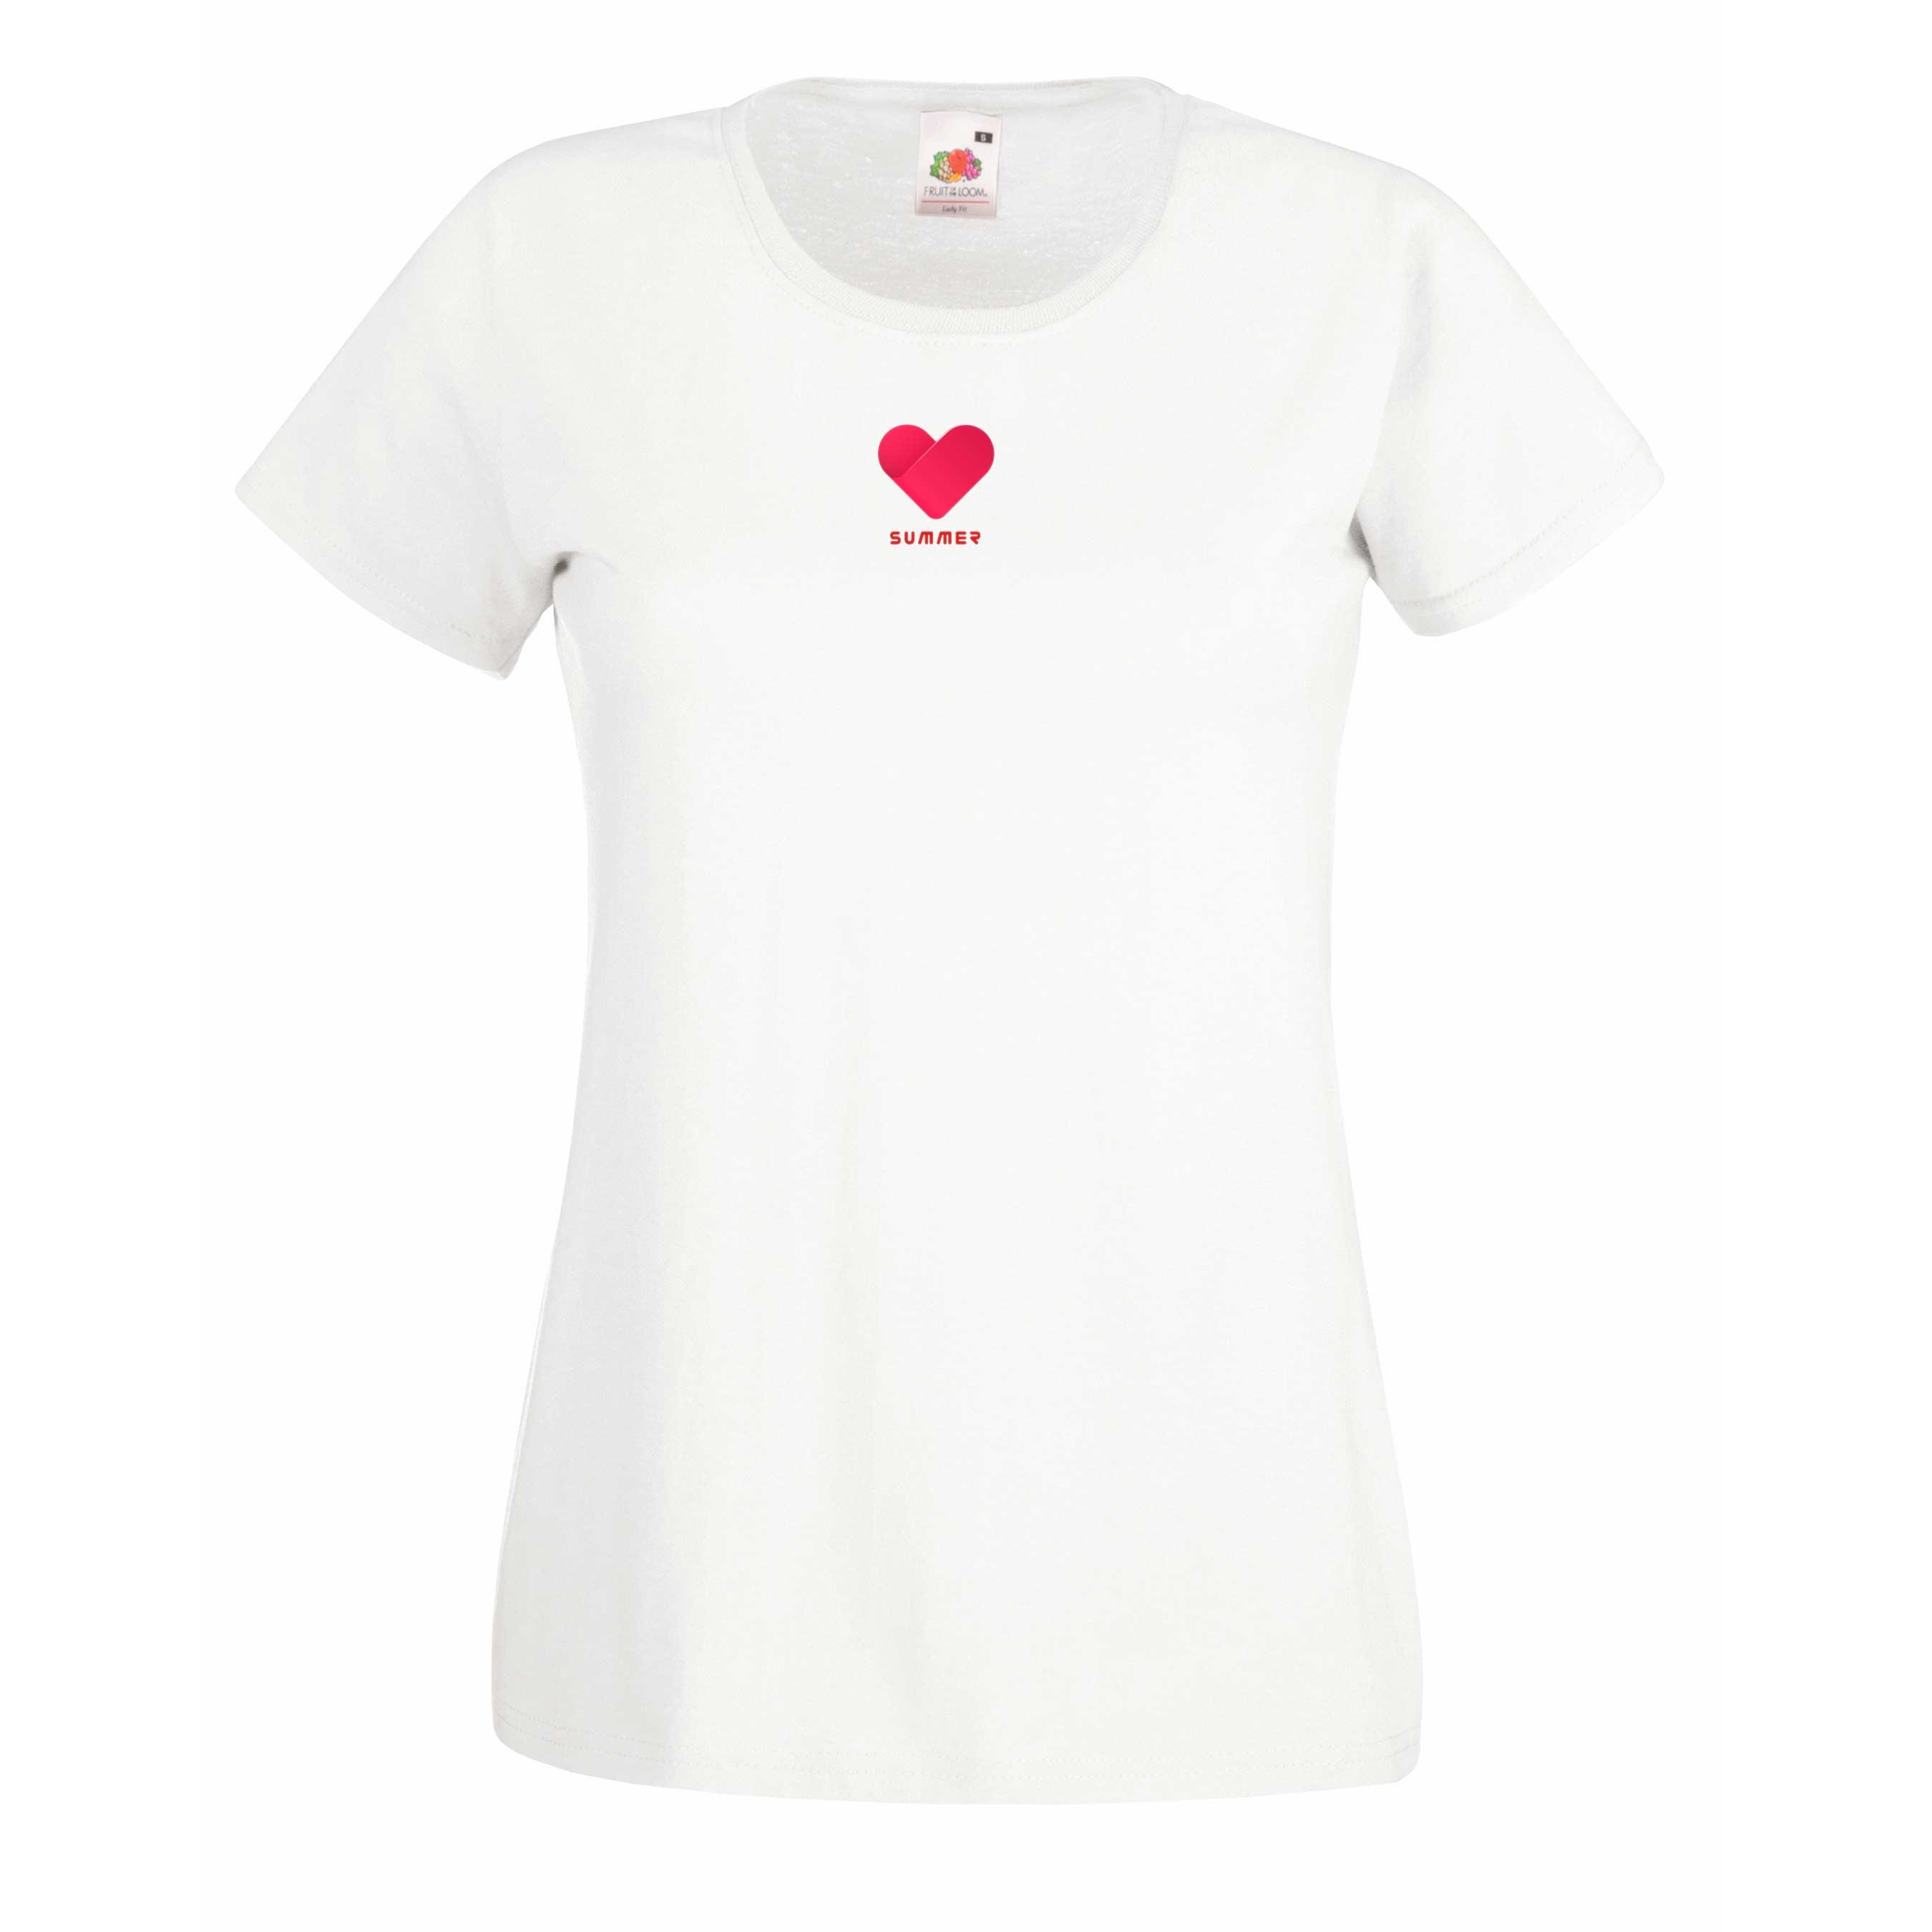 Luv Summer design for t-shirt, hoodie & sweatshirt